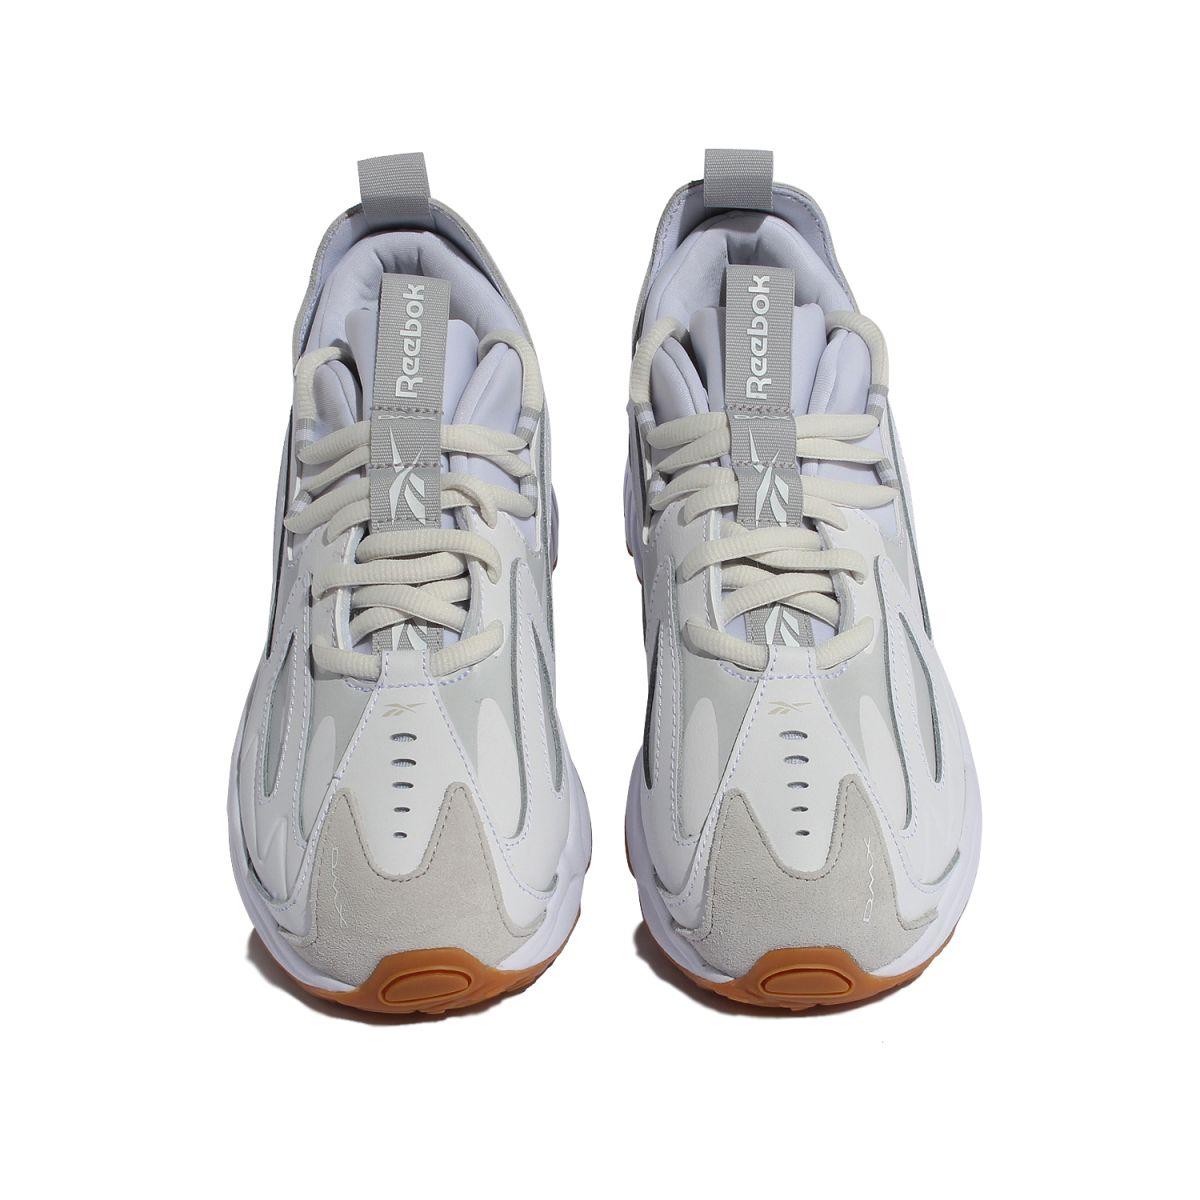 Reebok Reebok DMX SERIES 1200 LT Lady's men FU9132 classical music shoes